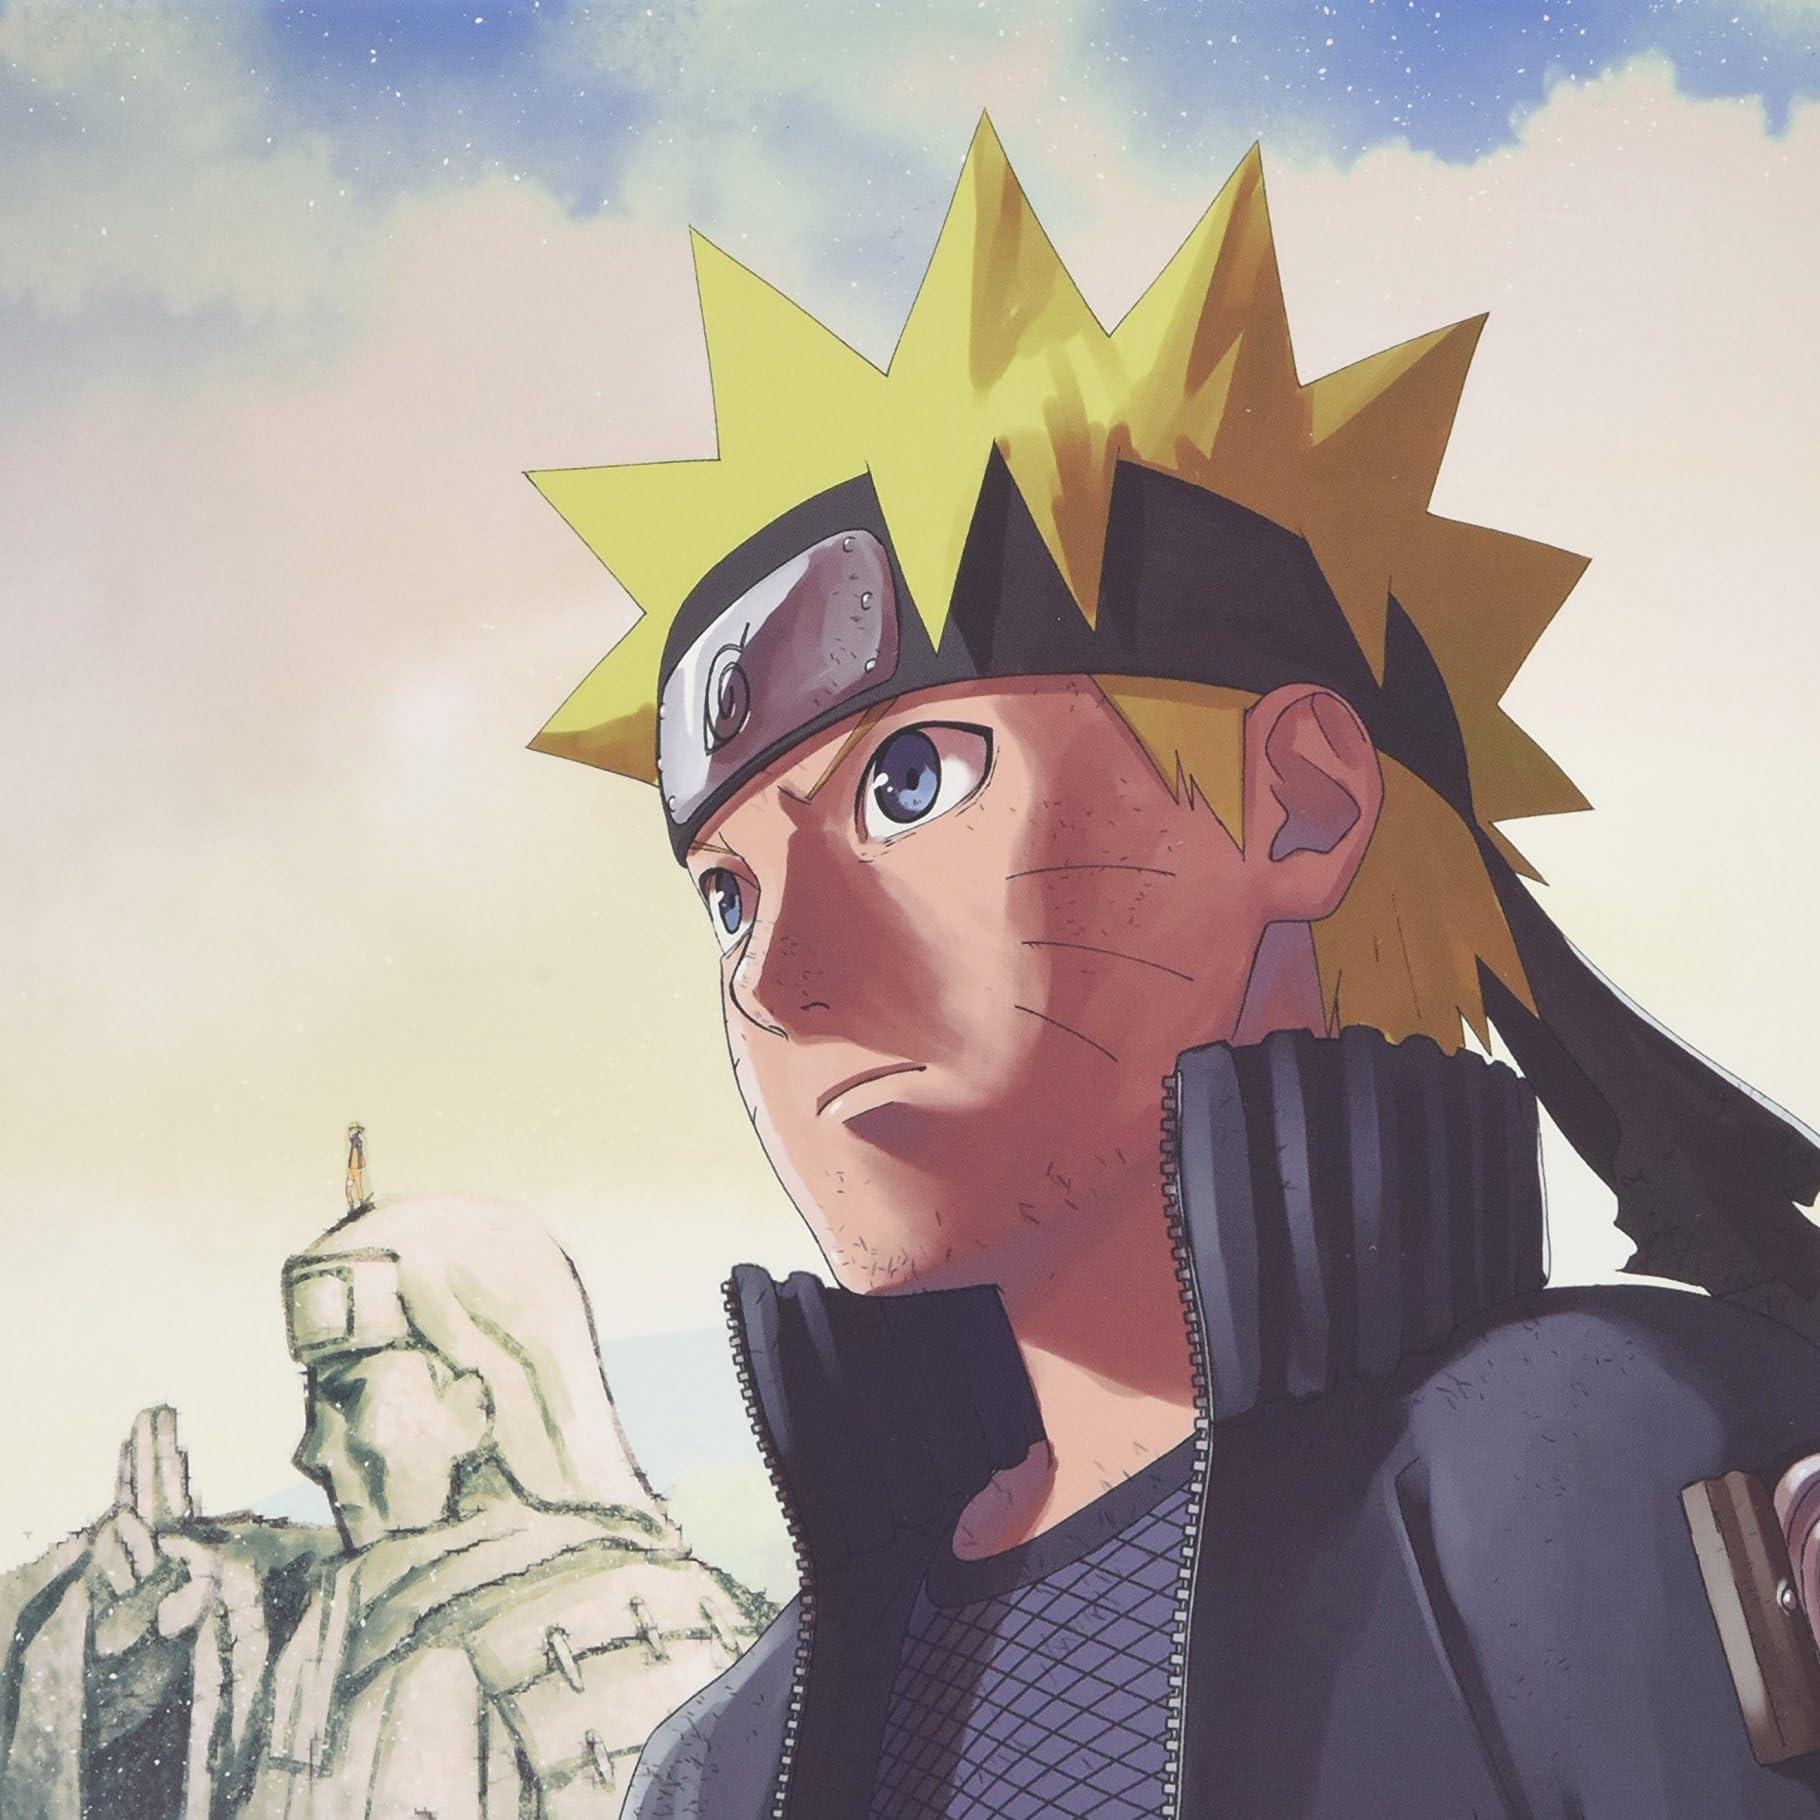 Naruto ナルト うずまきナルト Ipad壁紙 画像67603 スマポ